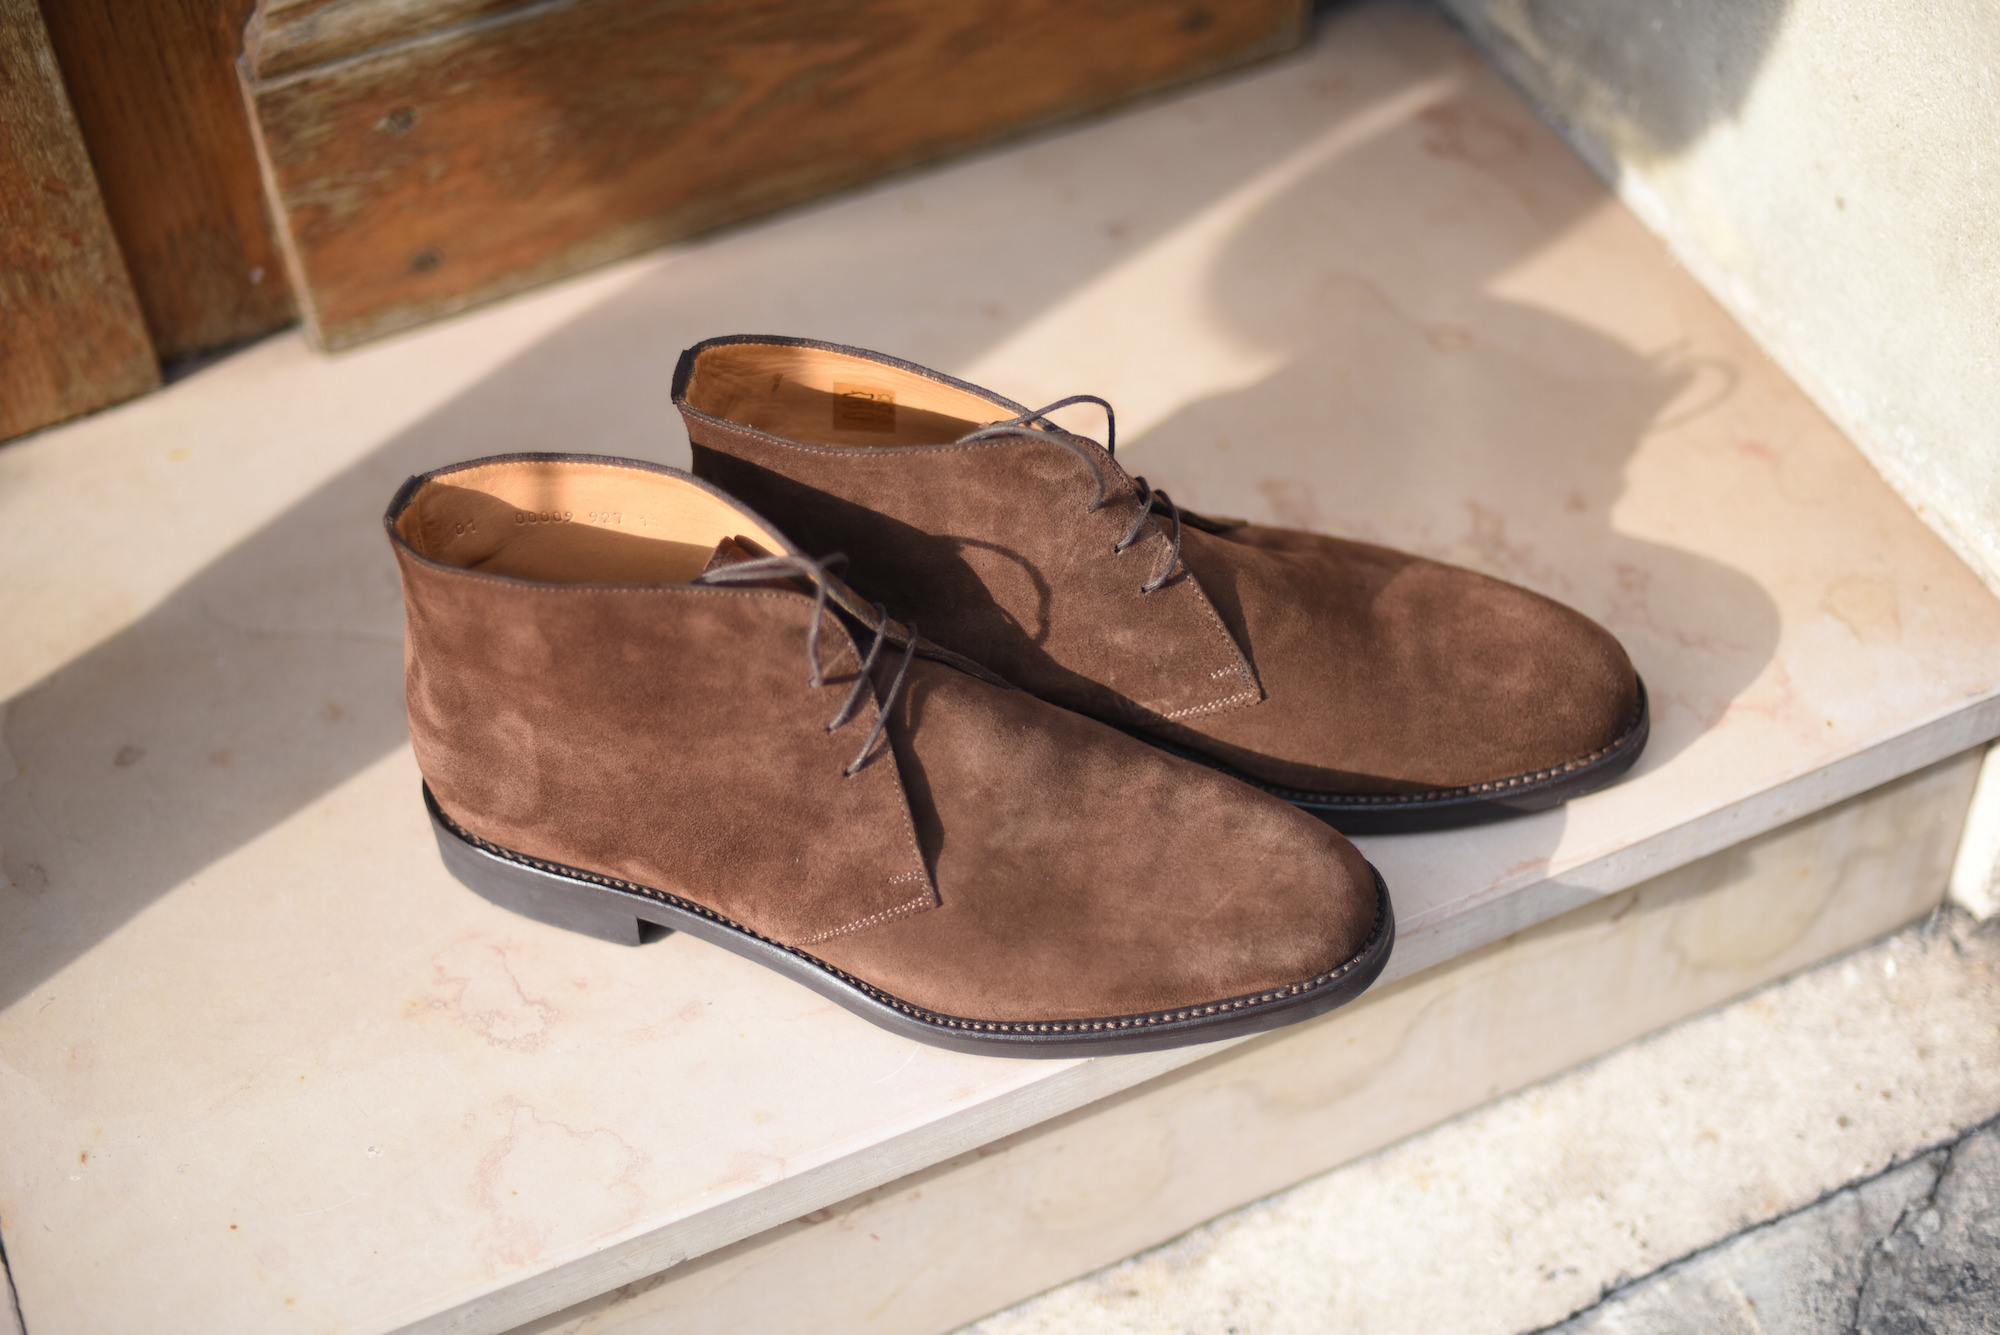 ypsons chukka boots maron